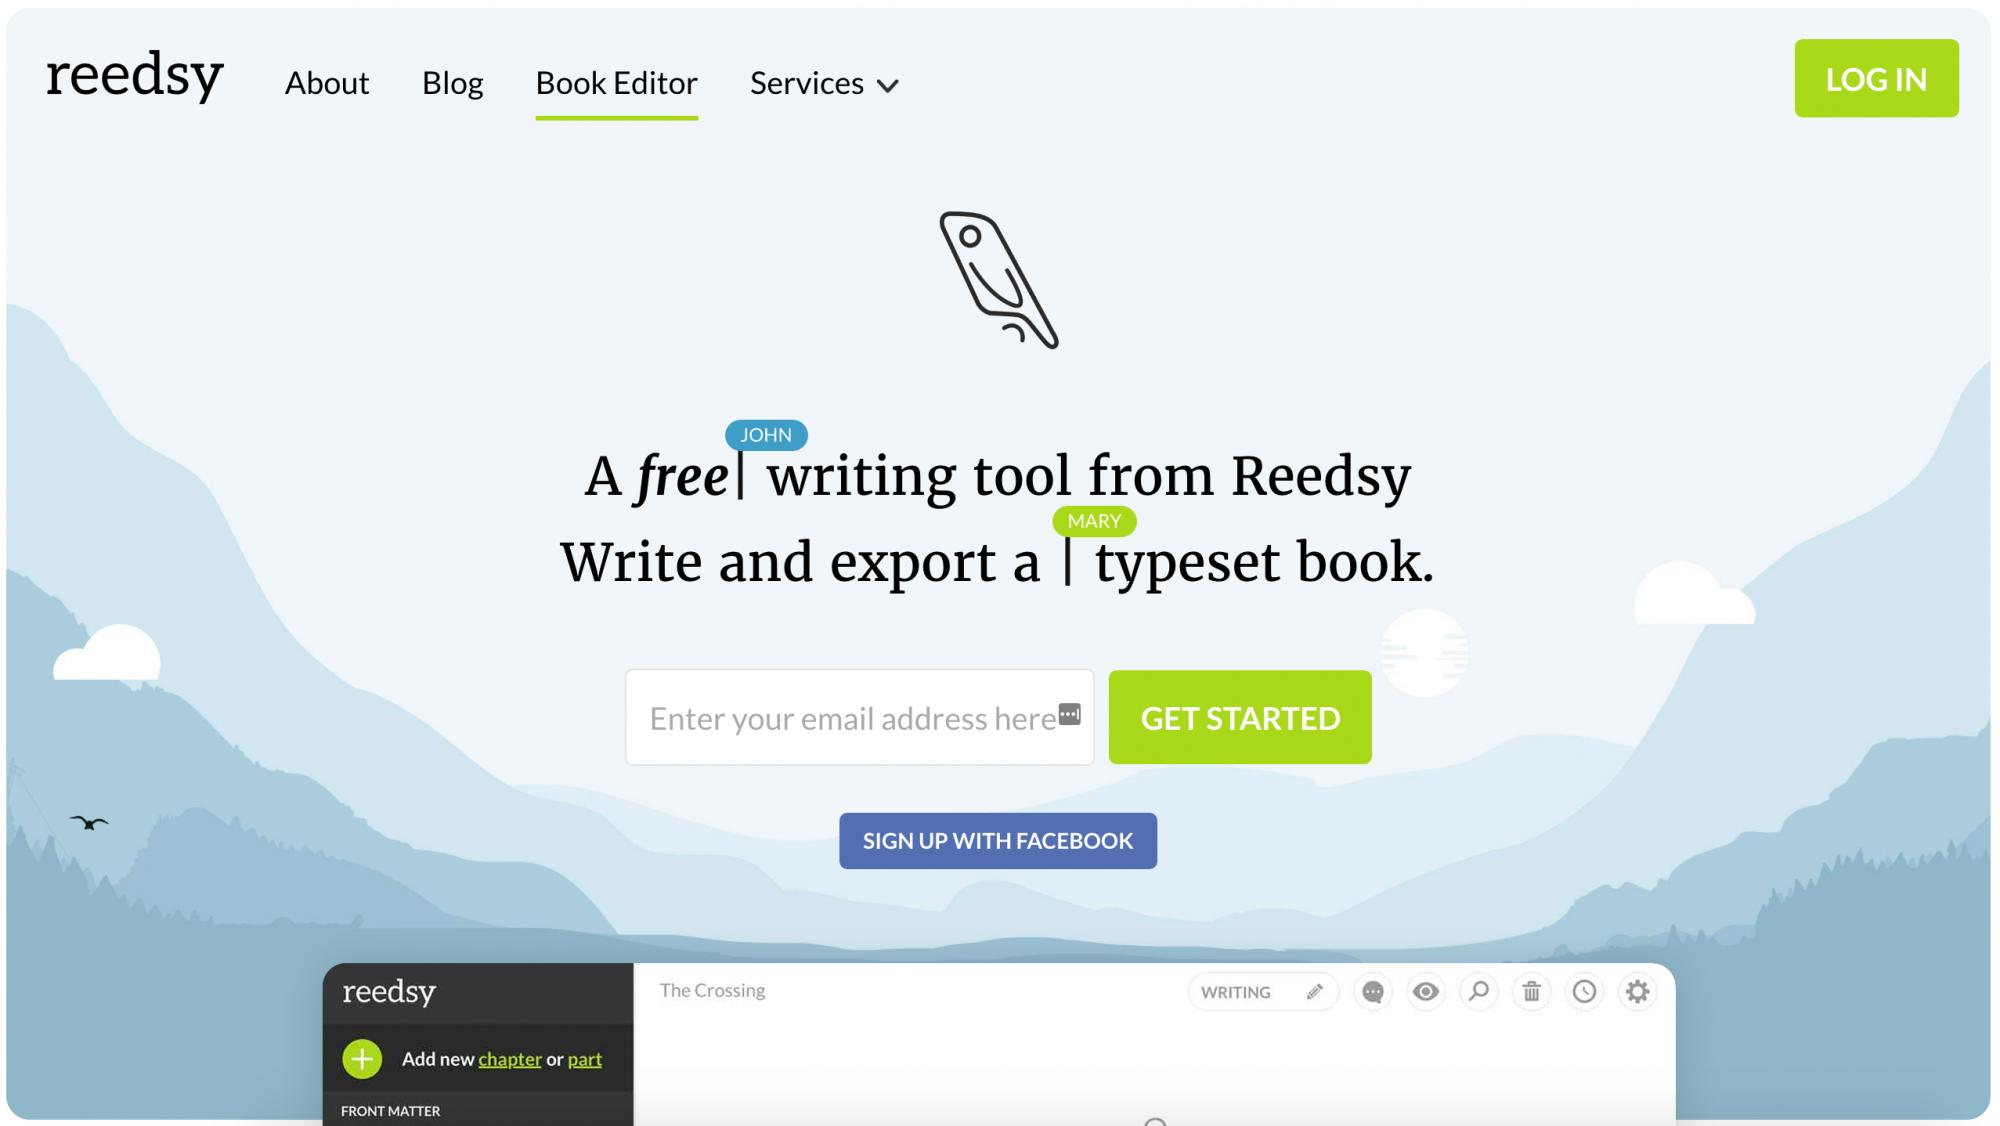 Reedsy Book Editor